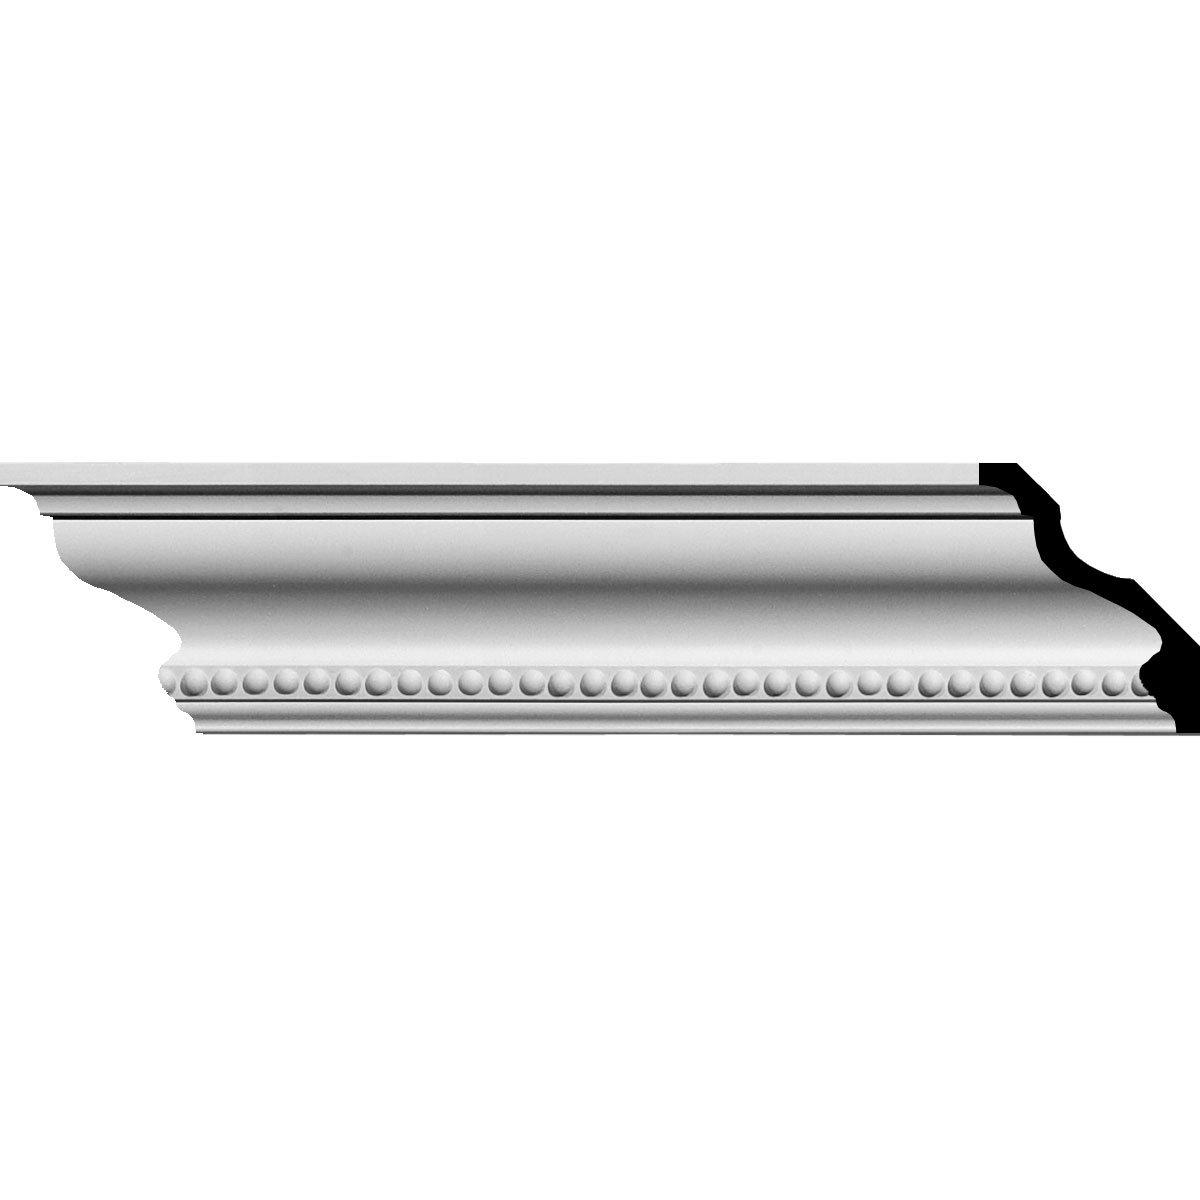 Ekena Millwork MLD03X02X04VA 3-Inch H x 2 1/2-Inch P x 4-Inch F x 94 3/4-Inch L Valeriano Dentil Crown Molding (8-Pack)